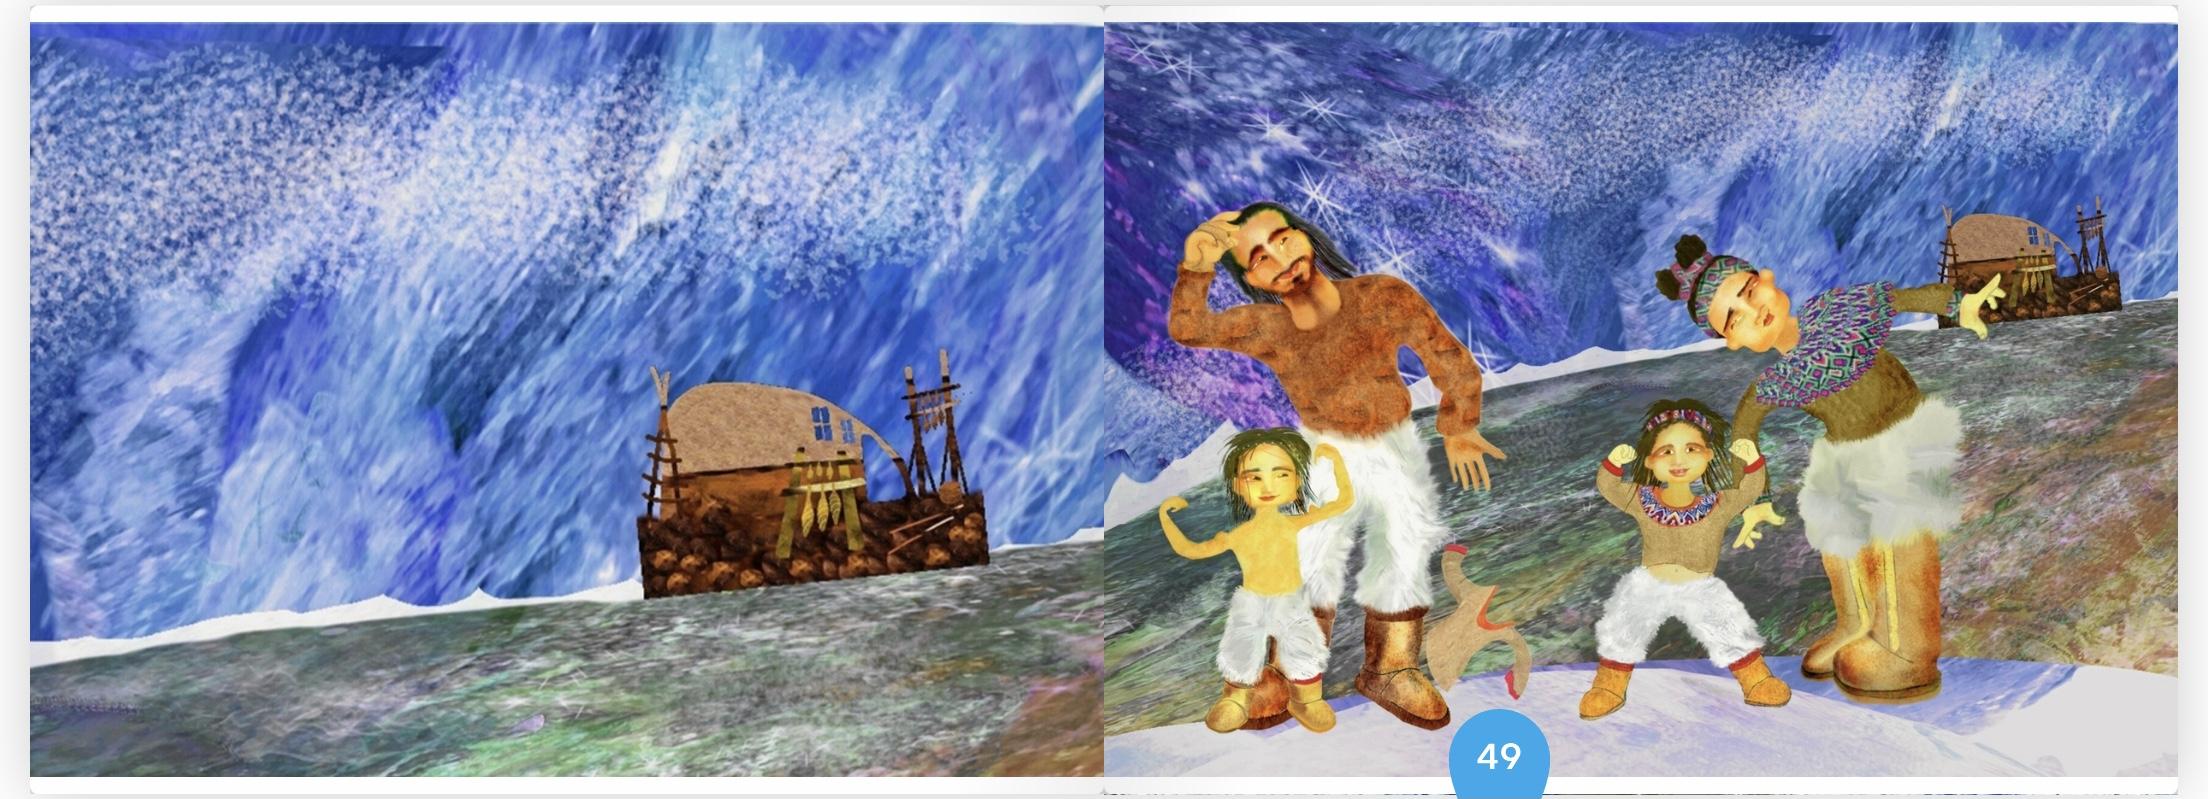 Children's book from Greenland by Malin Skinnar and Ingvar Karpsten